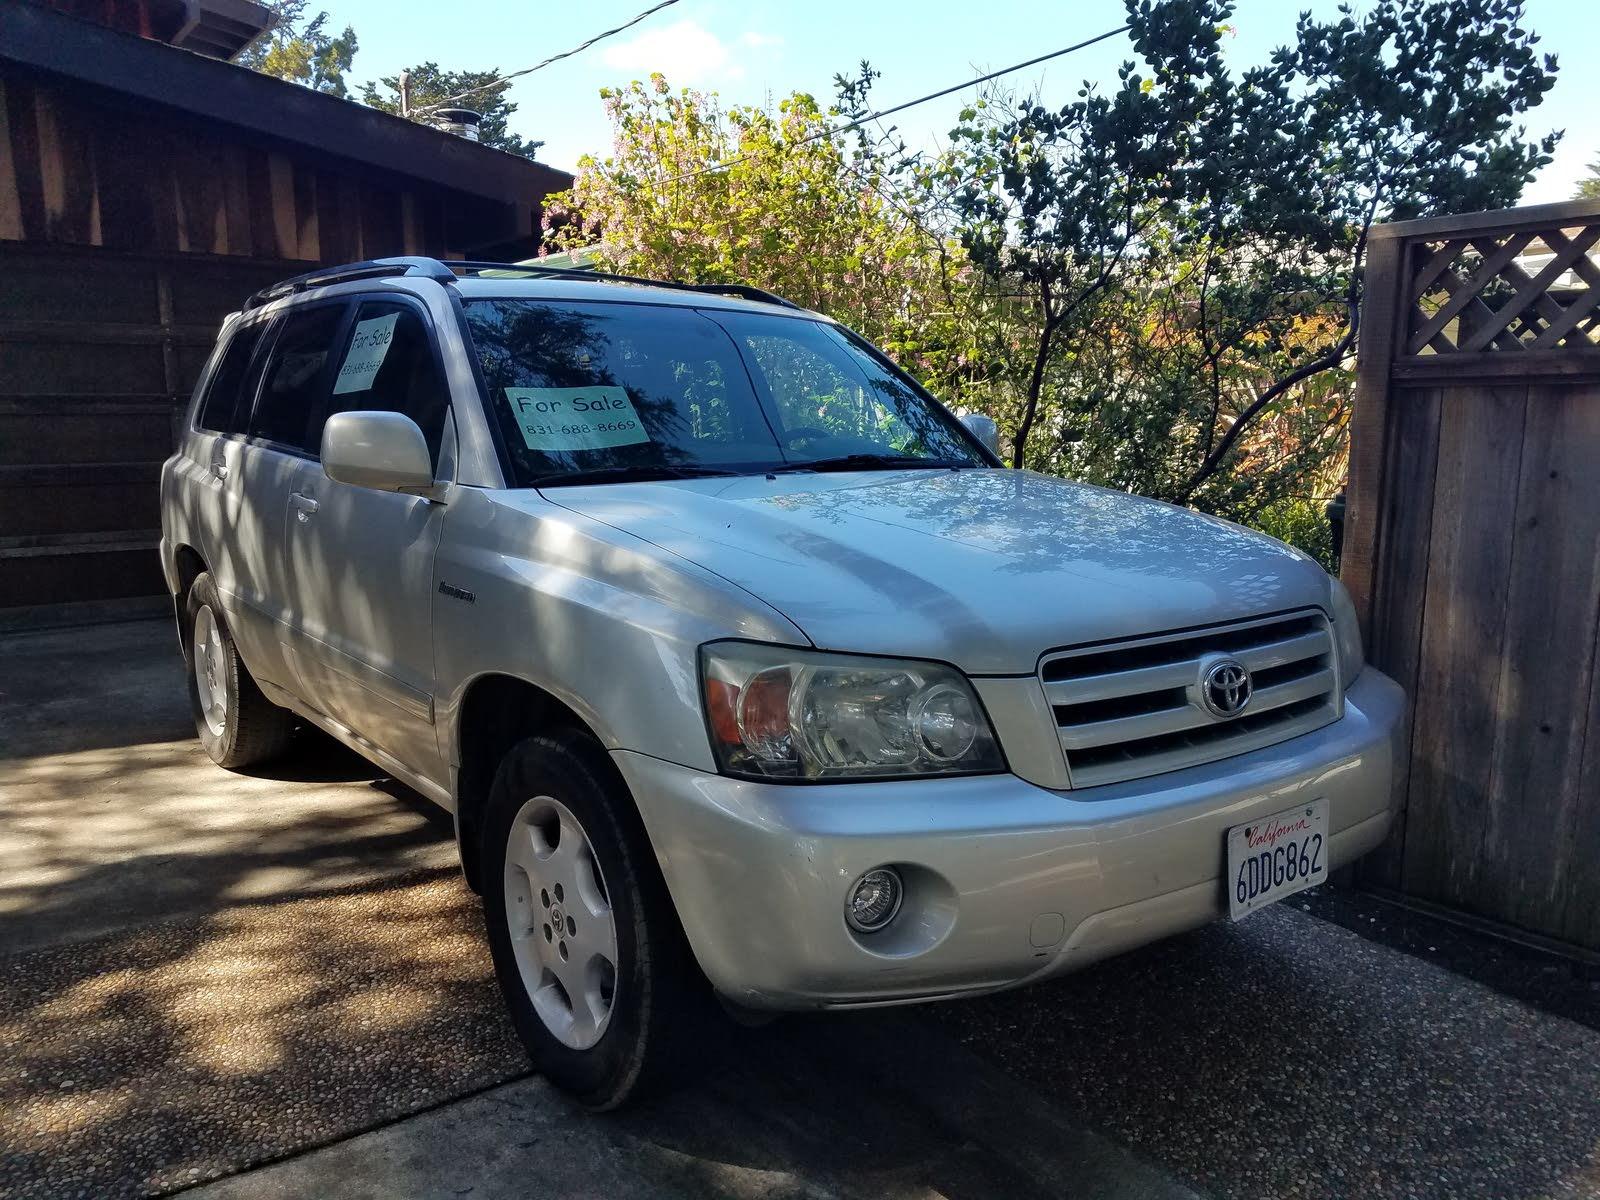 Toyota Highlander Questions - craigslist help - CarGurus